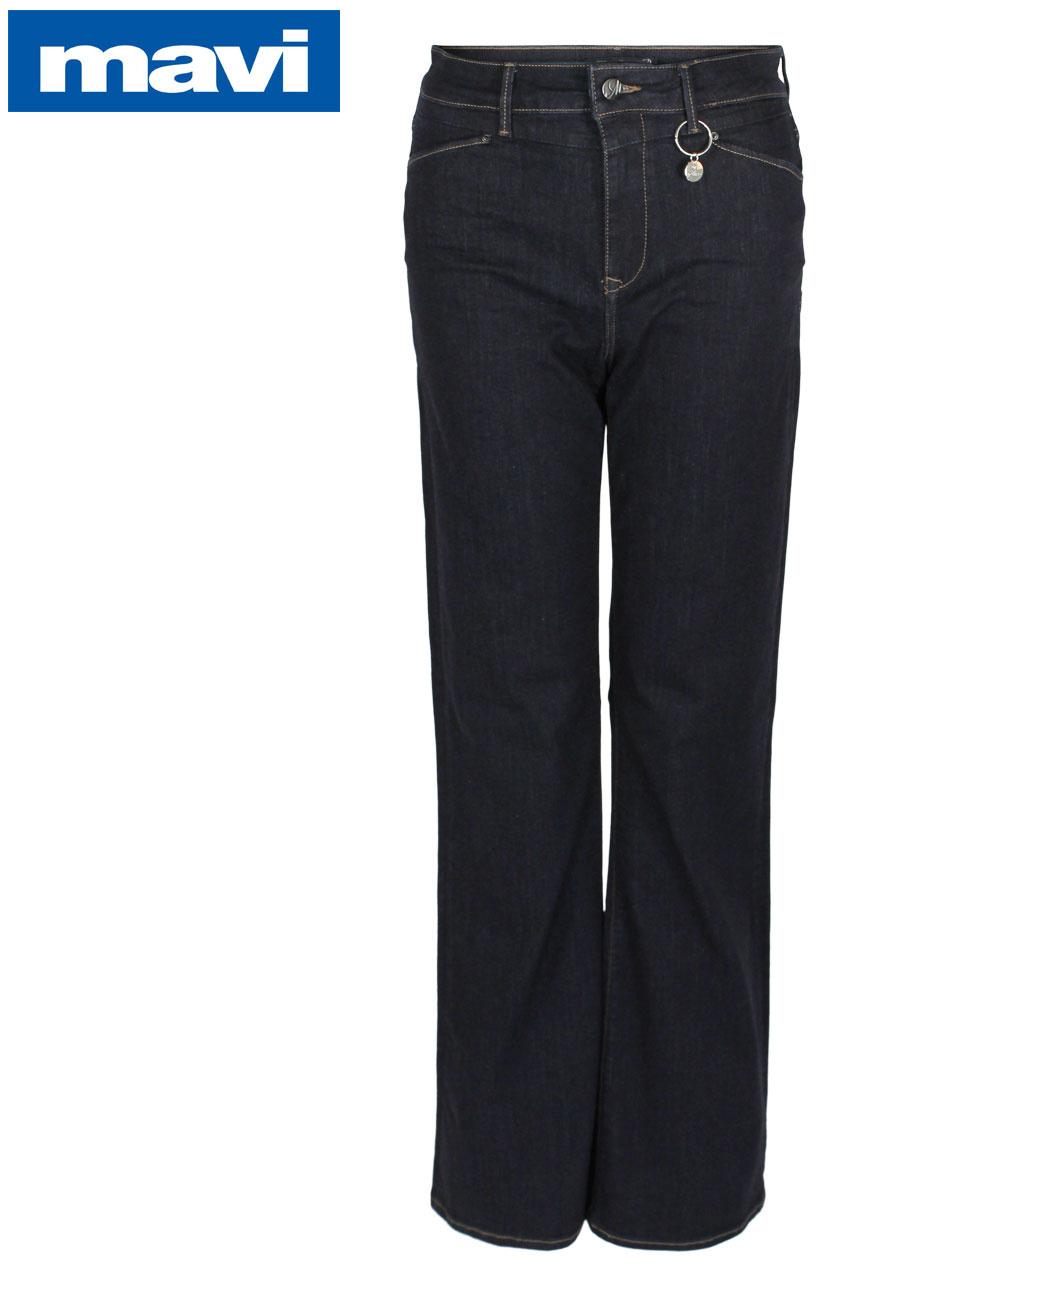 Tall Mavi Jeans Meghan Rinse Retro Longlady Fashion